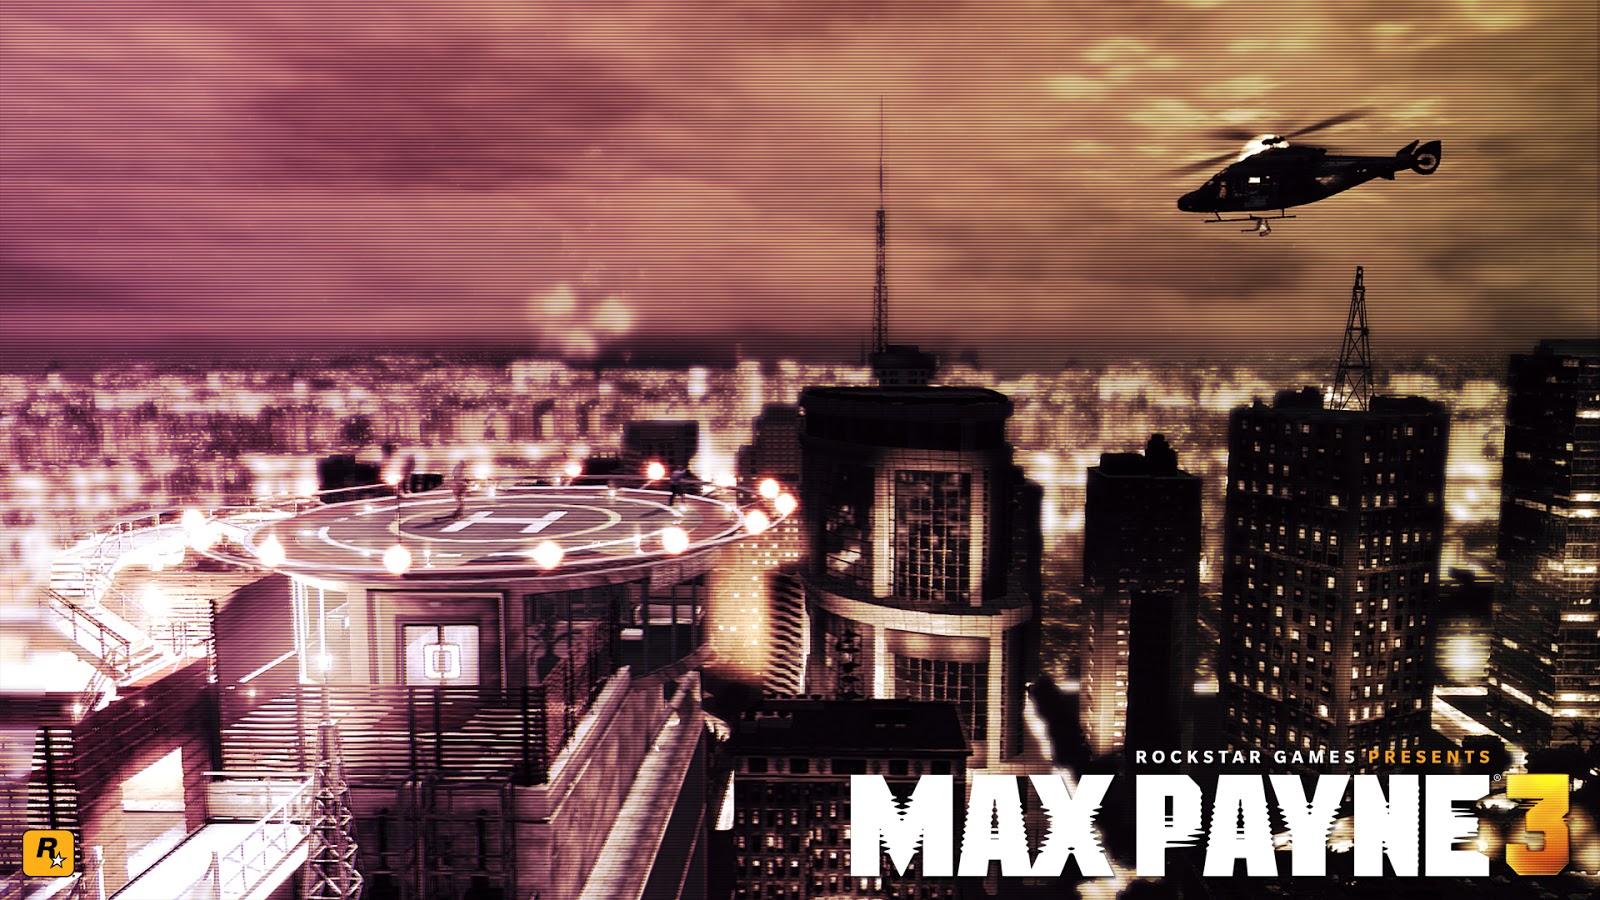 Fall Max Payne Hd Wallpapers Wallpapers Hd 39 Wallpapers Gamers Fondos De Pantalla